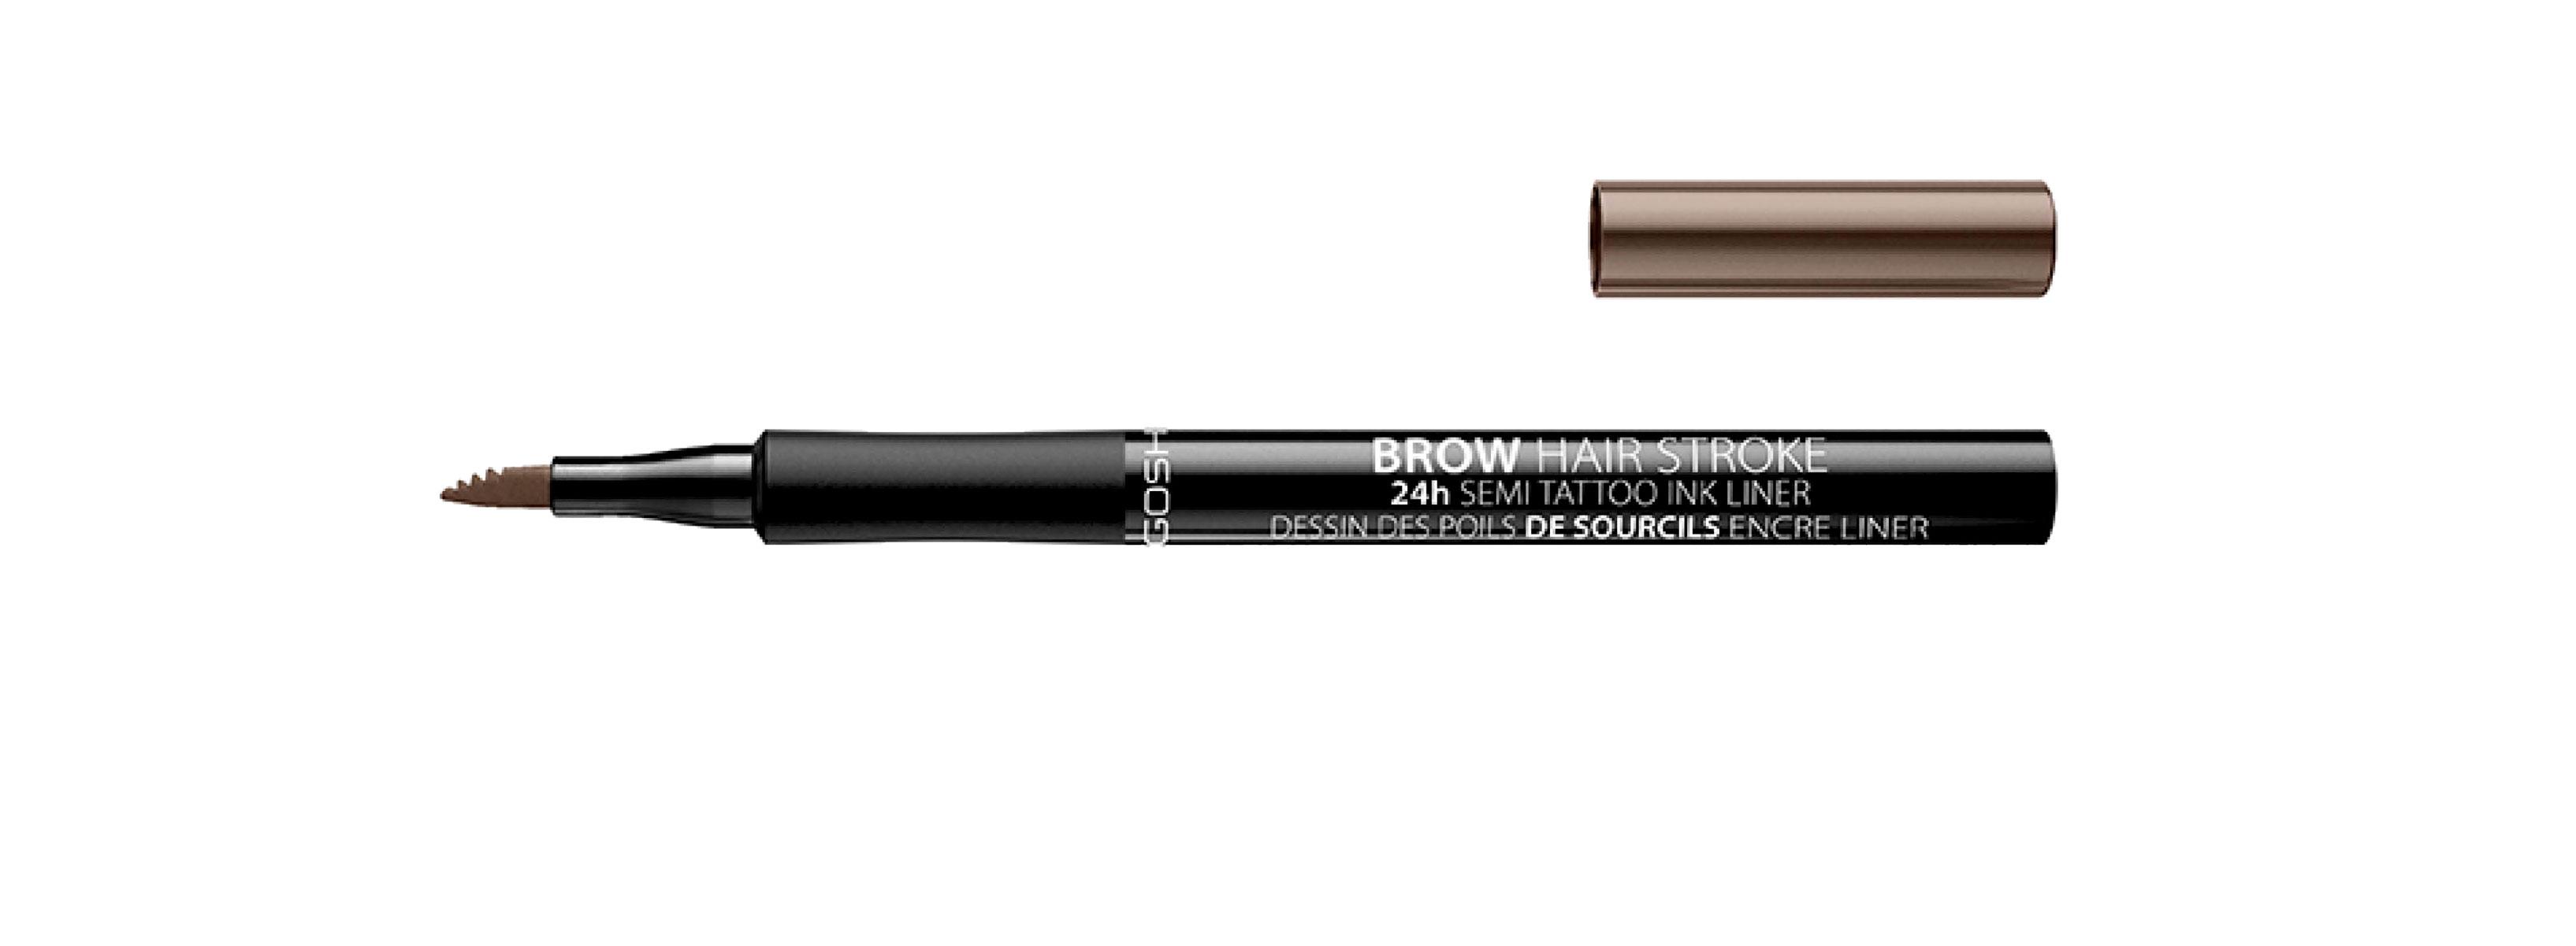 Gosh Brow Hair Stroke 24h Semi Tattoo Ink Liner -kulmatussi, sävy 002 Greybrown, 15,50 e.